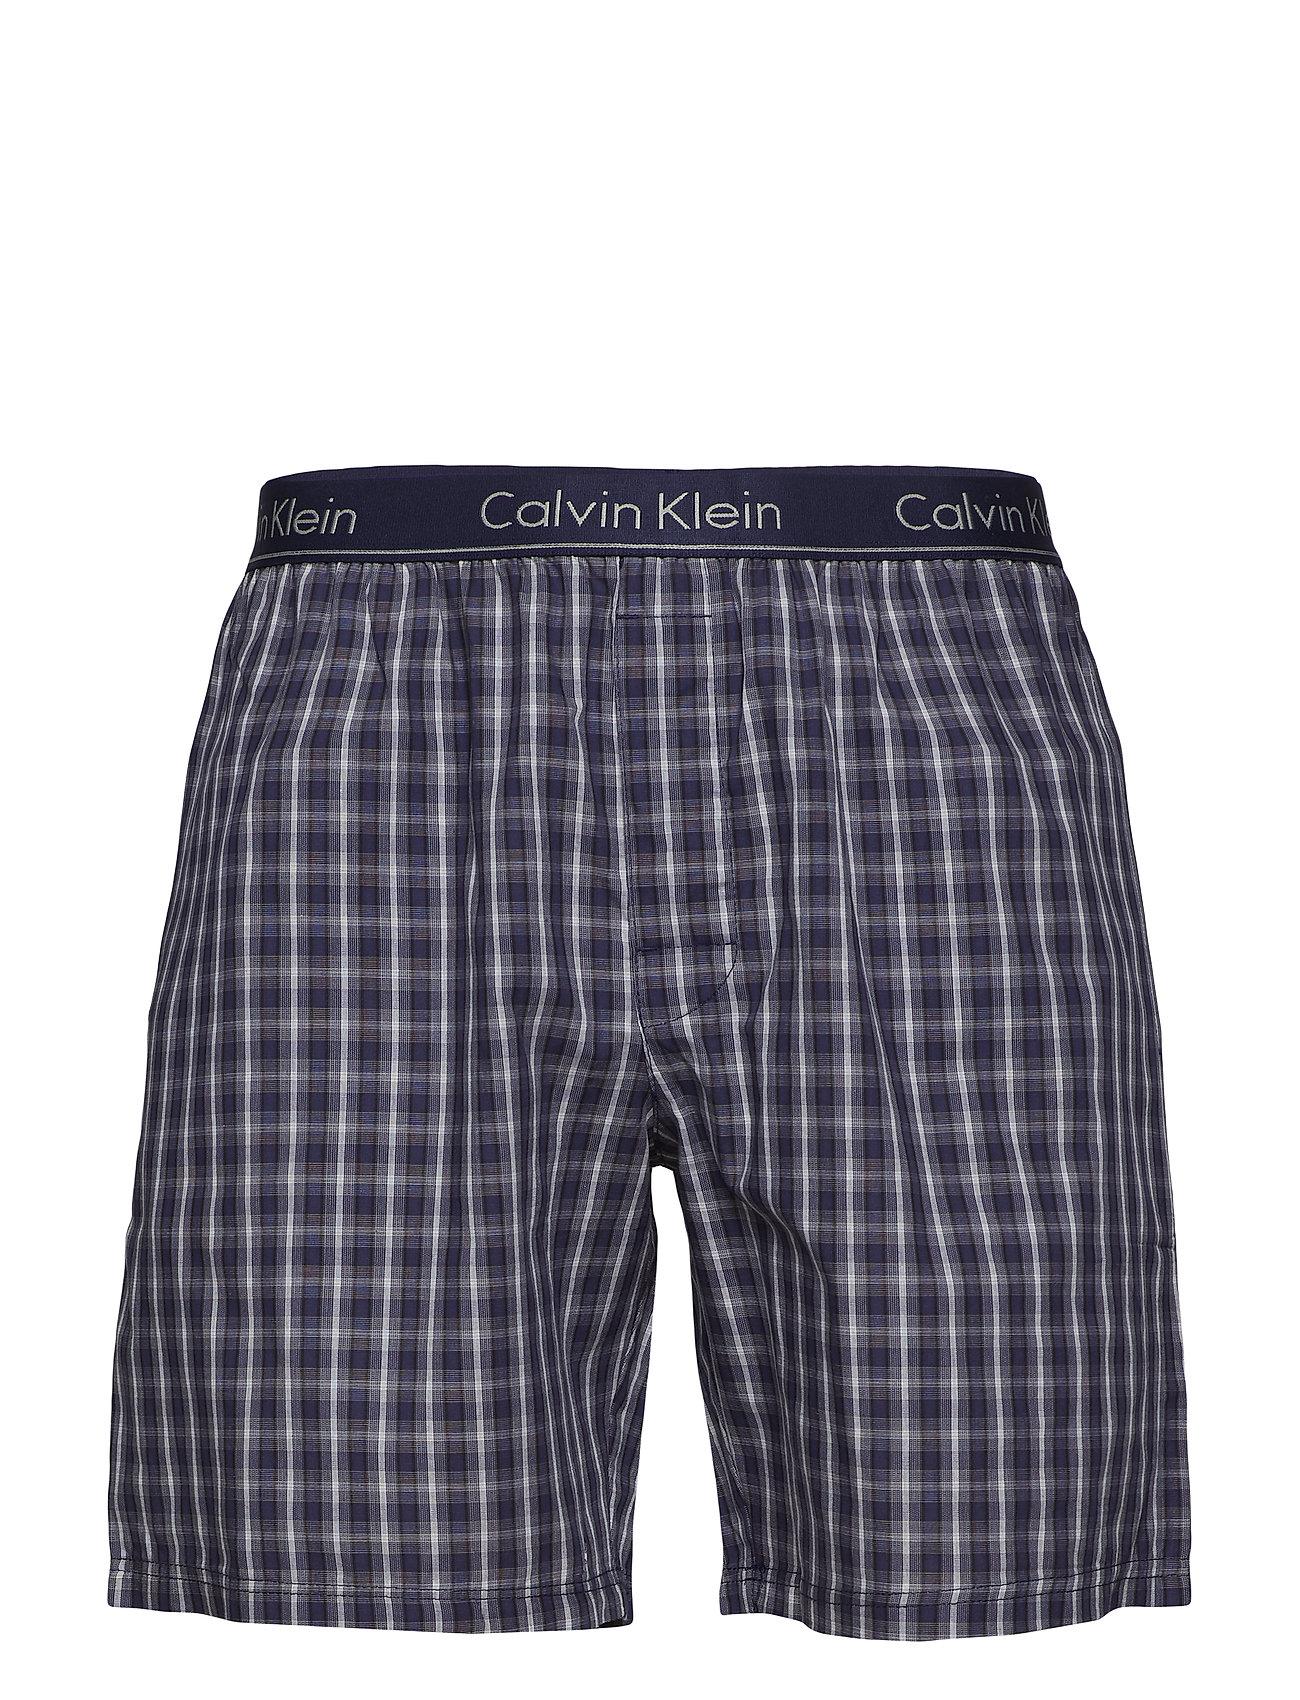 5424cd92758 B NAVY TOP/ CLARK PLAID BOLD N Calvin Klein S/S Short Set pyjamas ...